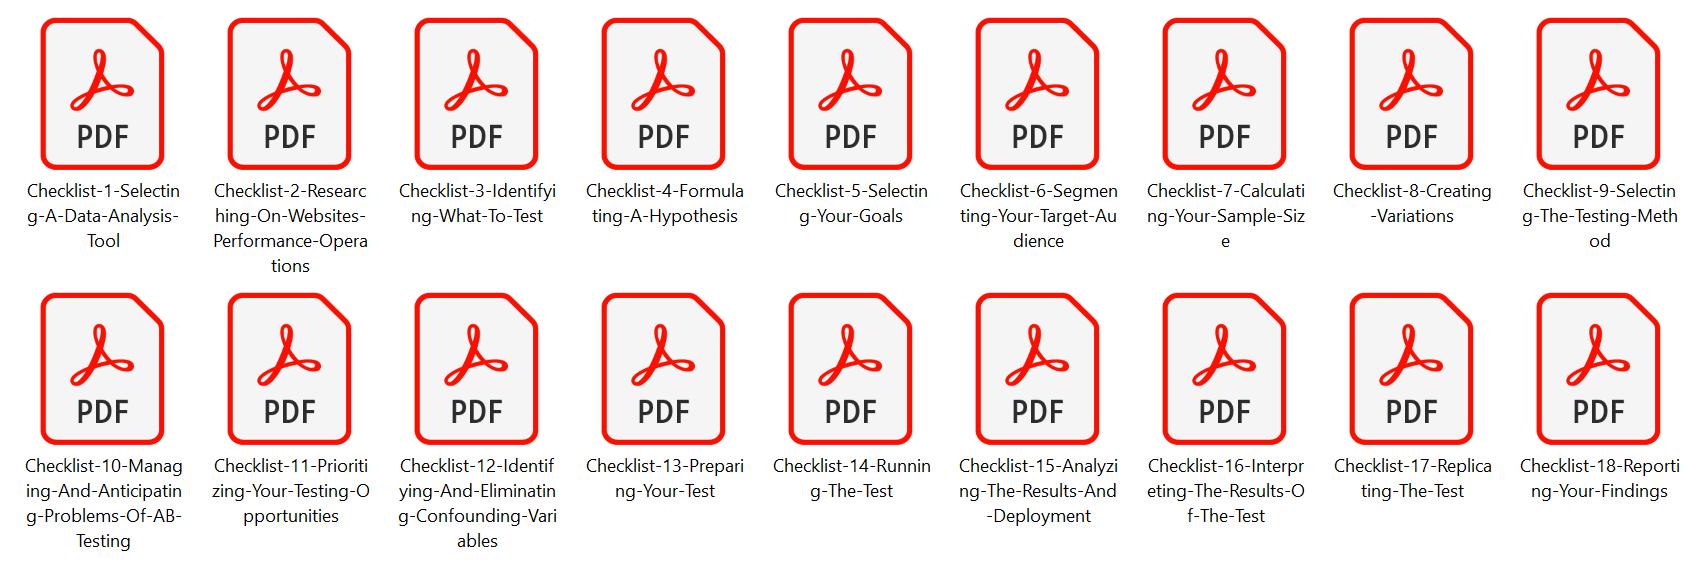 Internet Marketing Checklists Split Testing and Optimization Screenshot